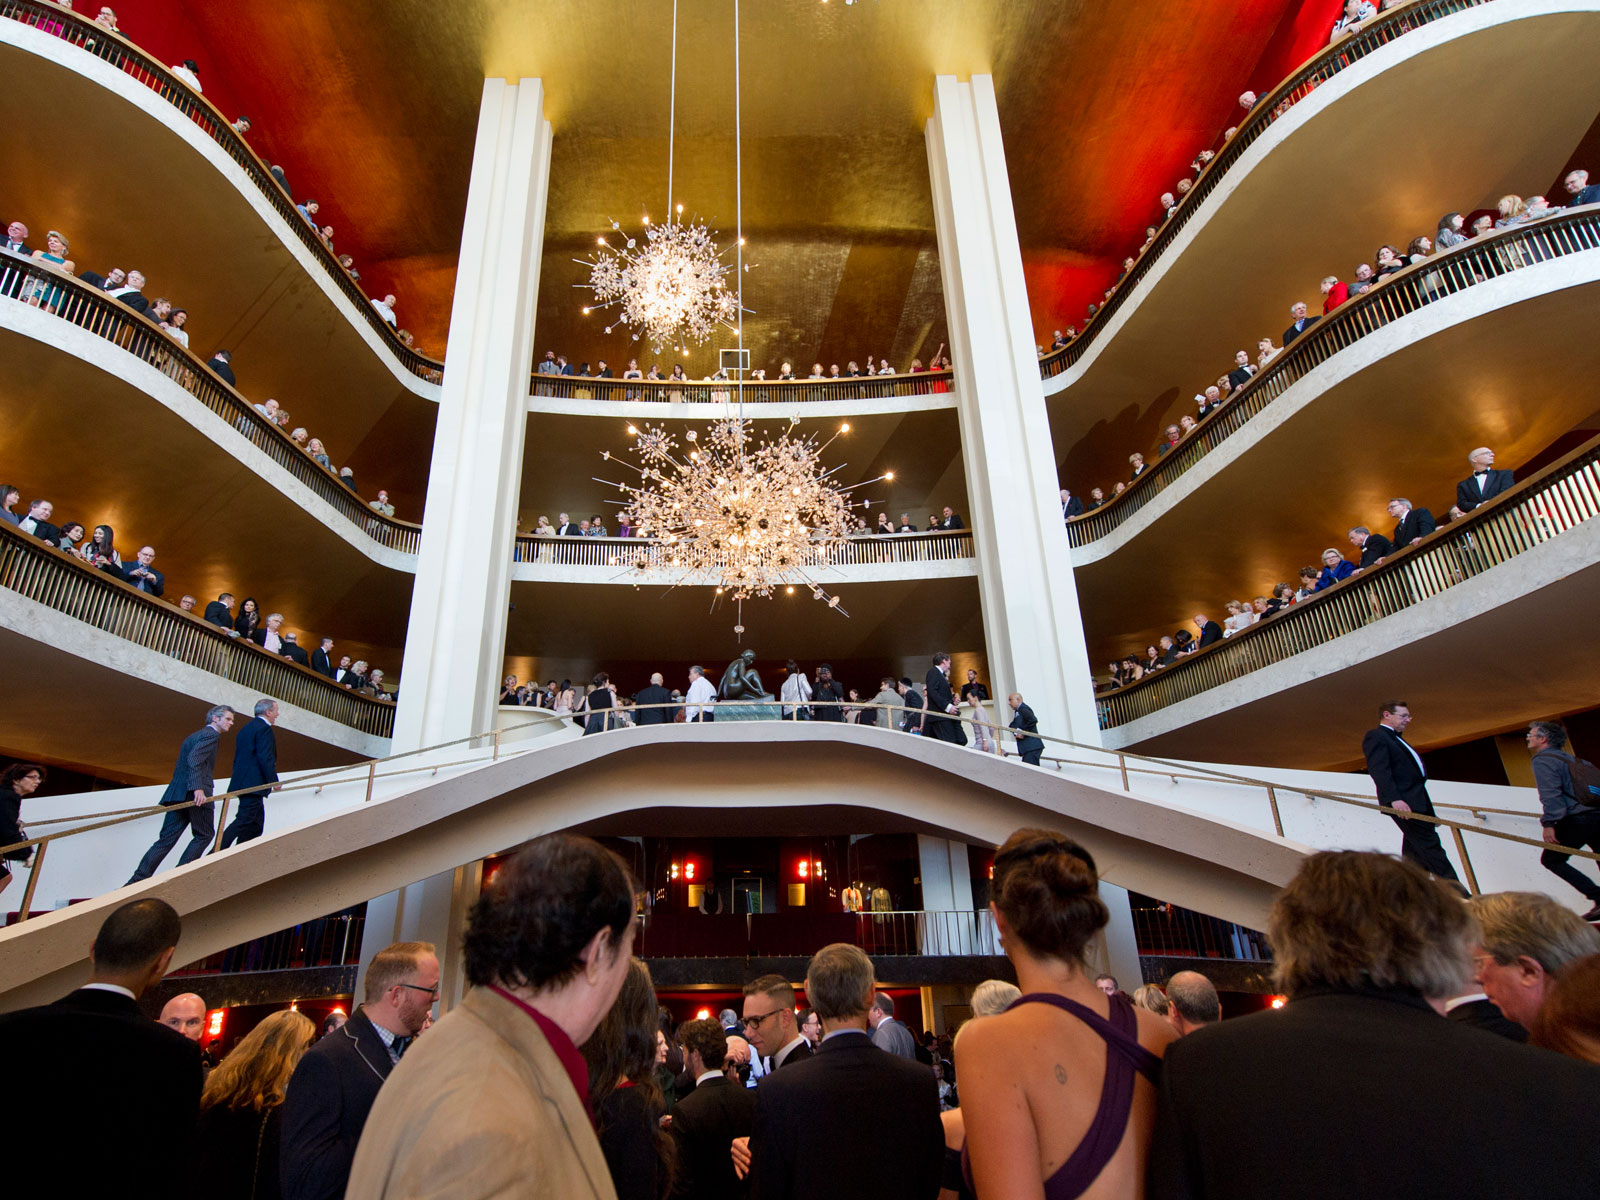 Lobby of The Metropolitan Opera before a performance.